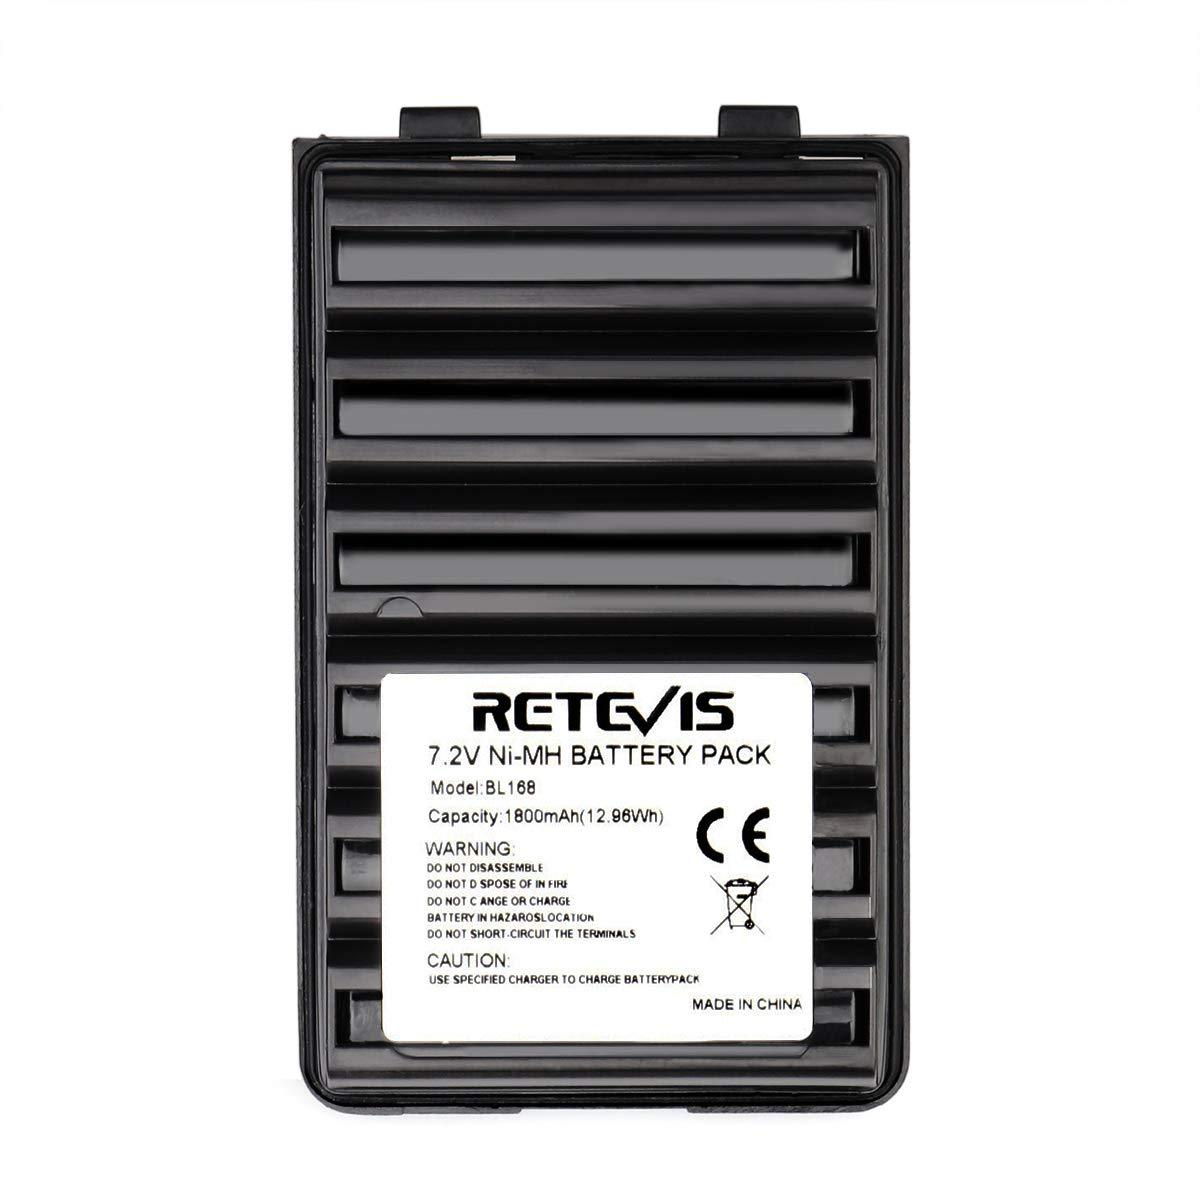 Retevis BL168 Two Way Radio Battery 7.2V 1800mAh Ni-MH Rechargeable Battery for Yaesu FT-60R VX-170 Vertex VX-150 VX-160 Walkie Talkies (1 Pack)